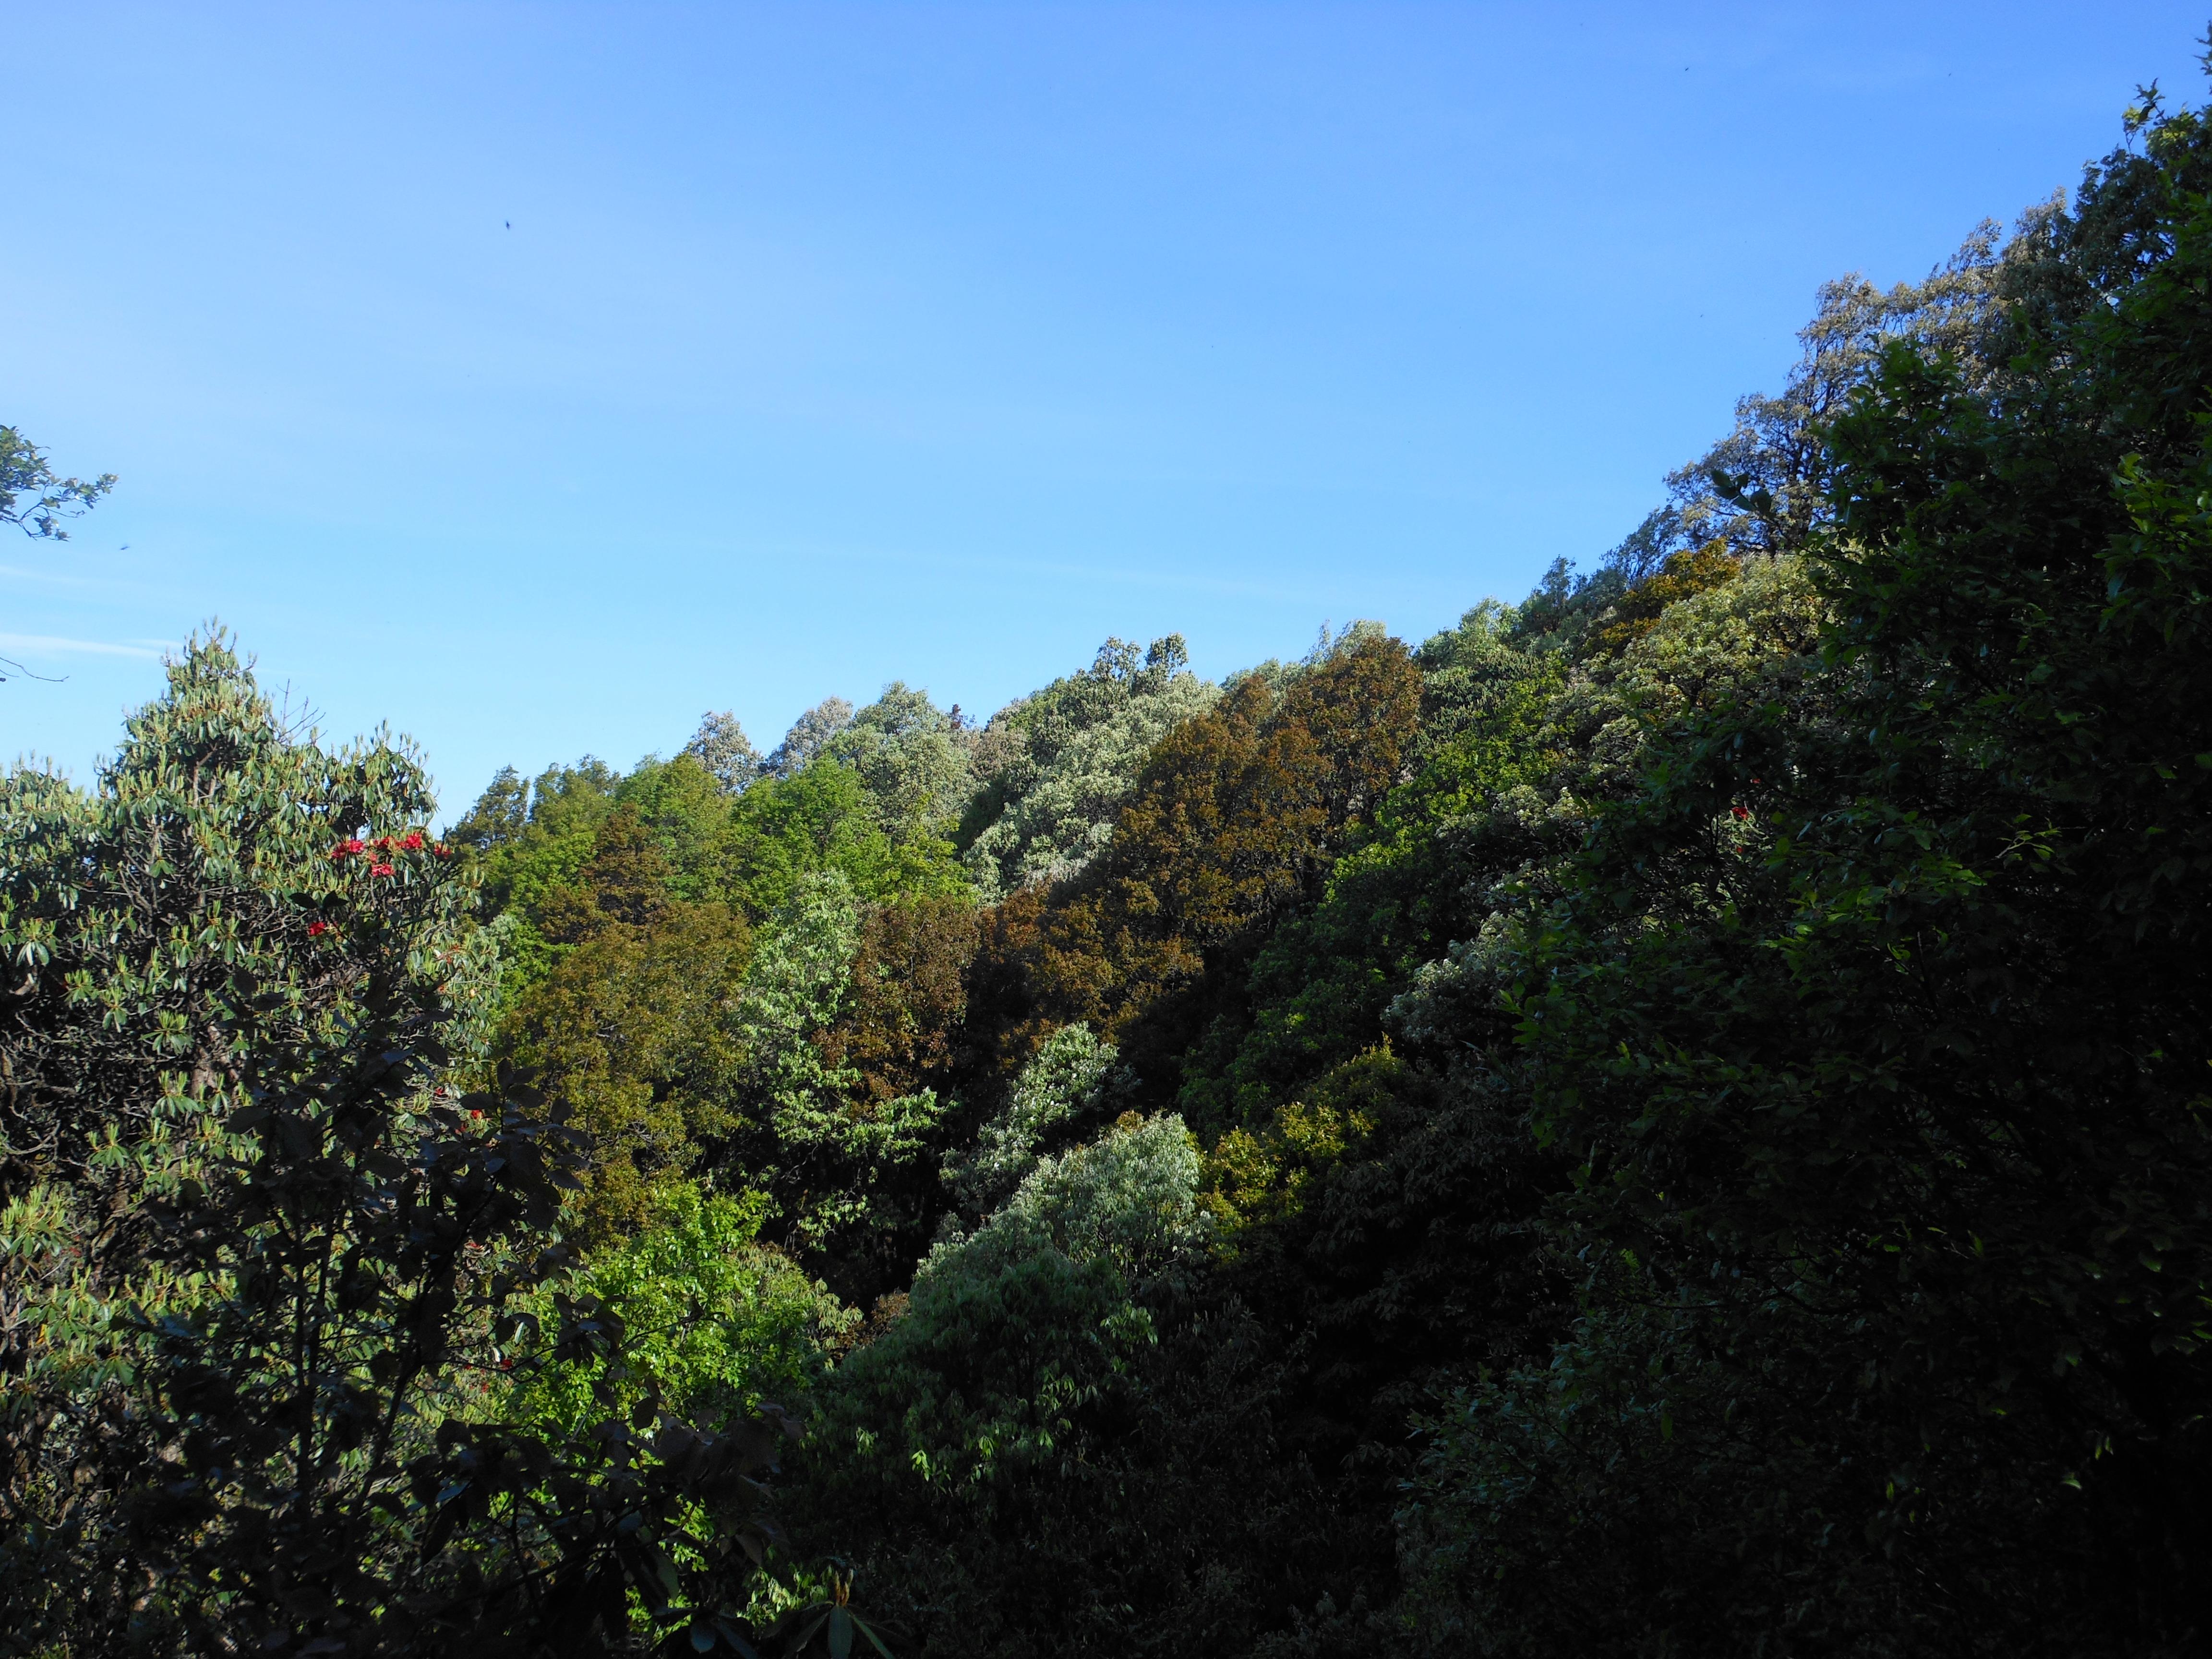 Binsar, Uttarakhand - A Fascinating Breakthrough. 4